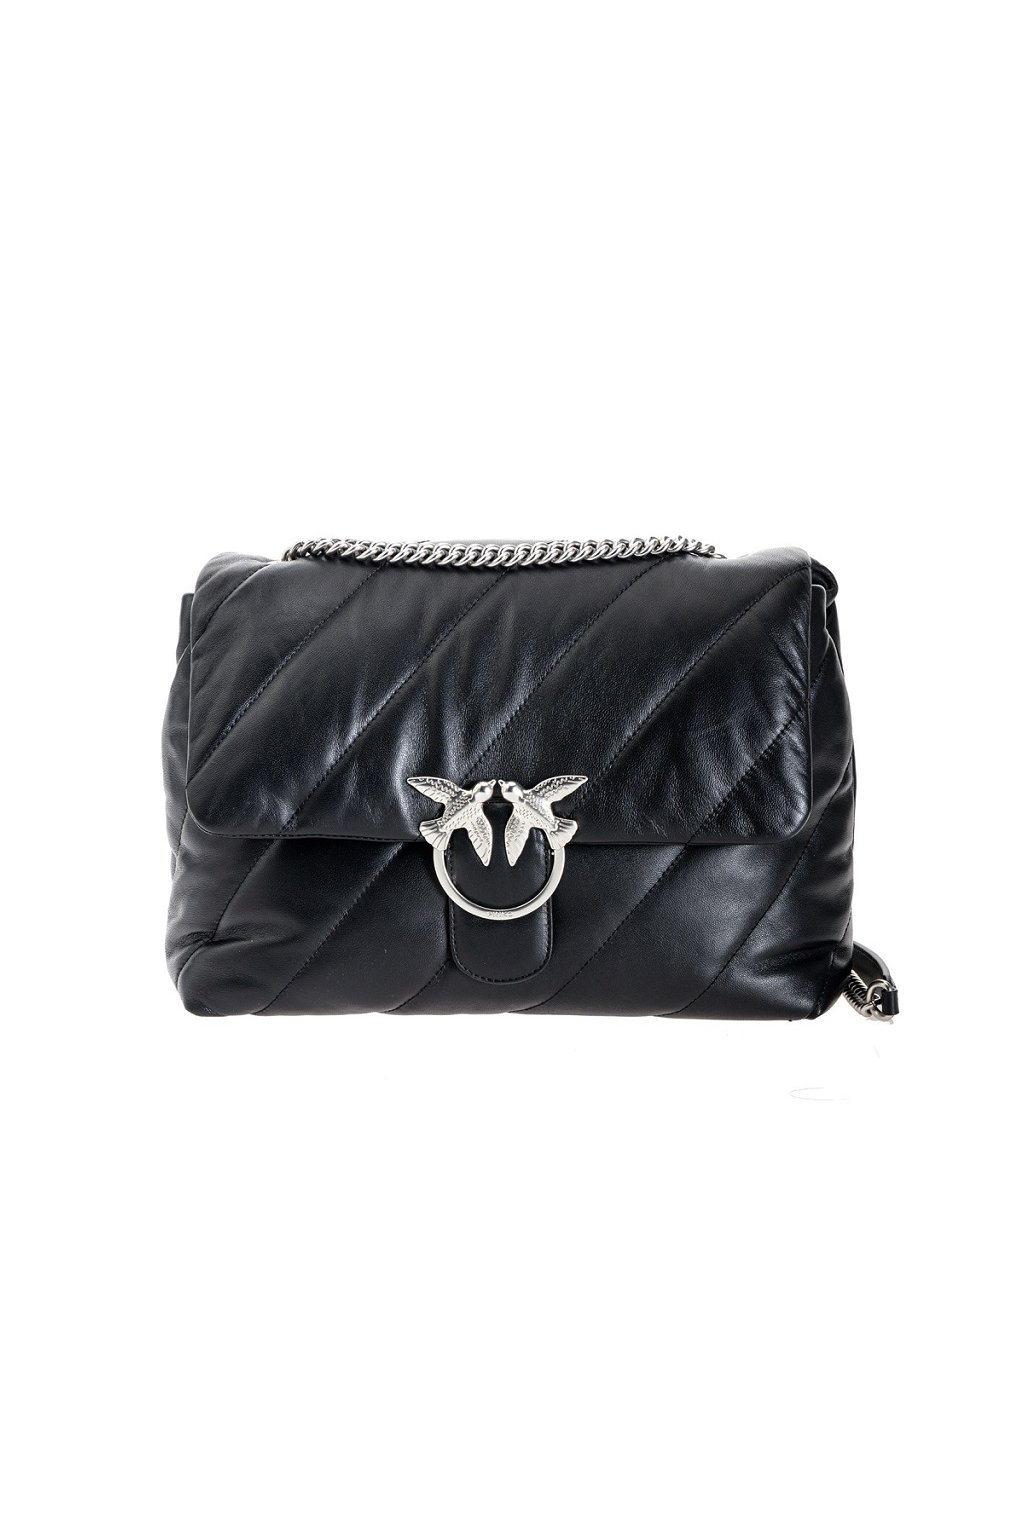 1P21VMY6JK Z99 Dámská kabelka Pinko Big Love Bag Puff Maxi Quilt In Nappa černá